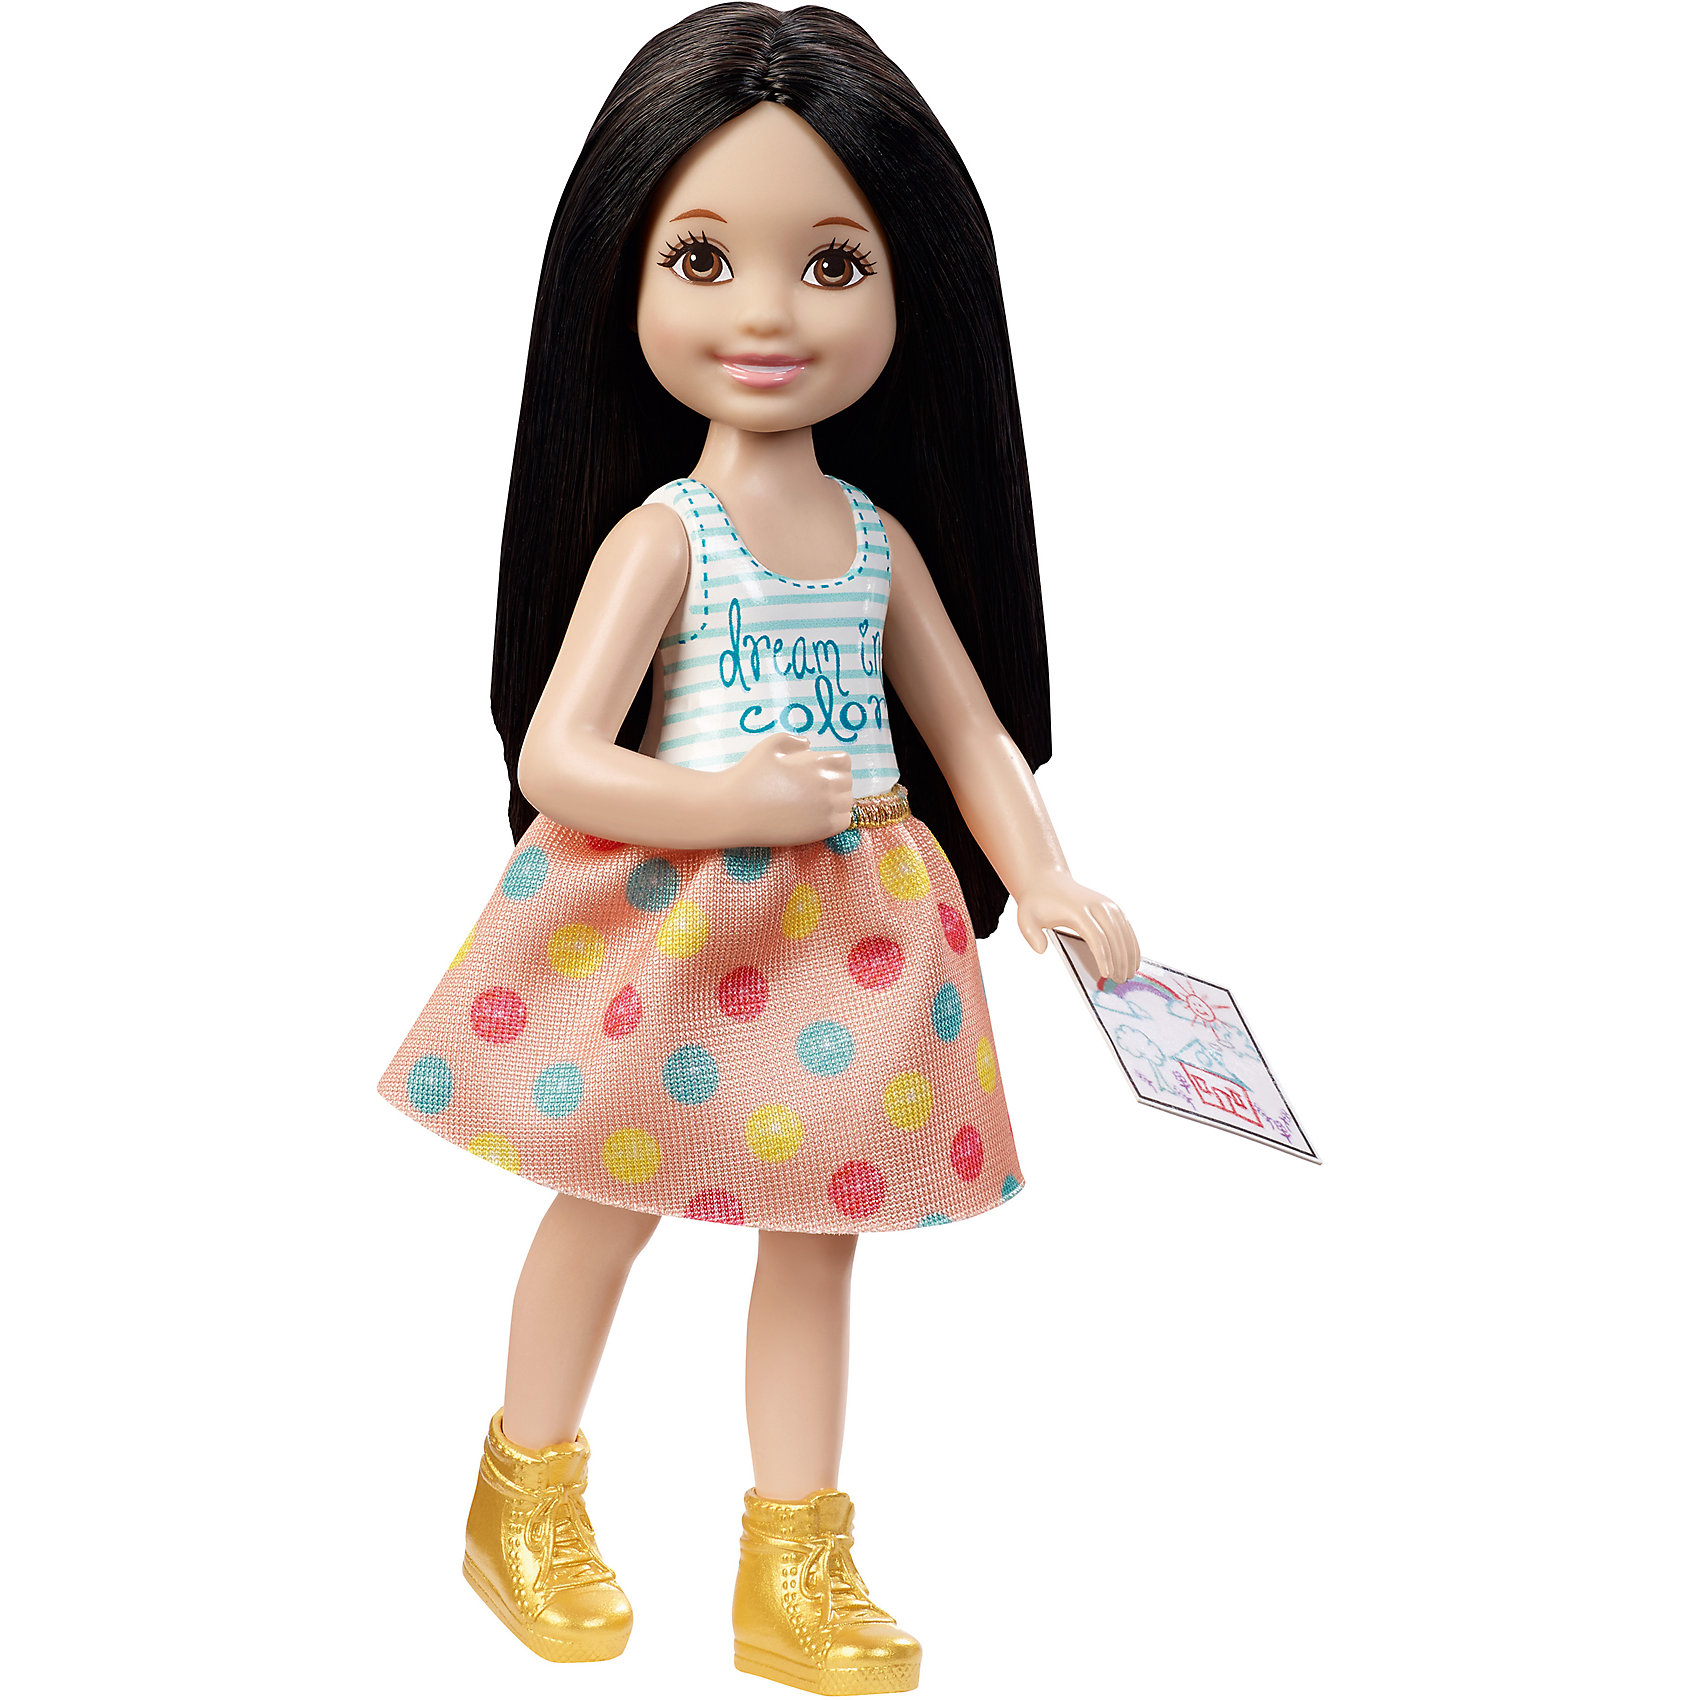 Mattel Кукла Челси, Barbie mattel кукла челси barbie